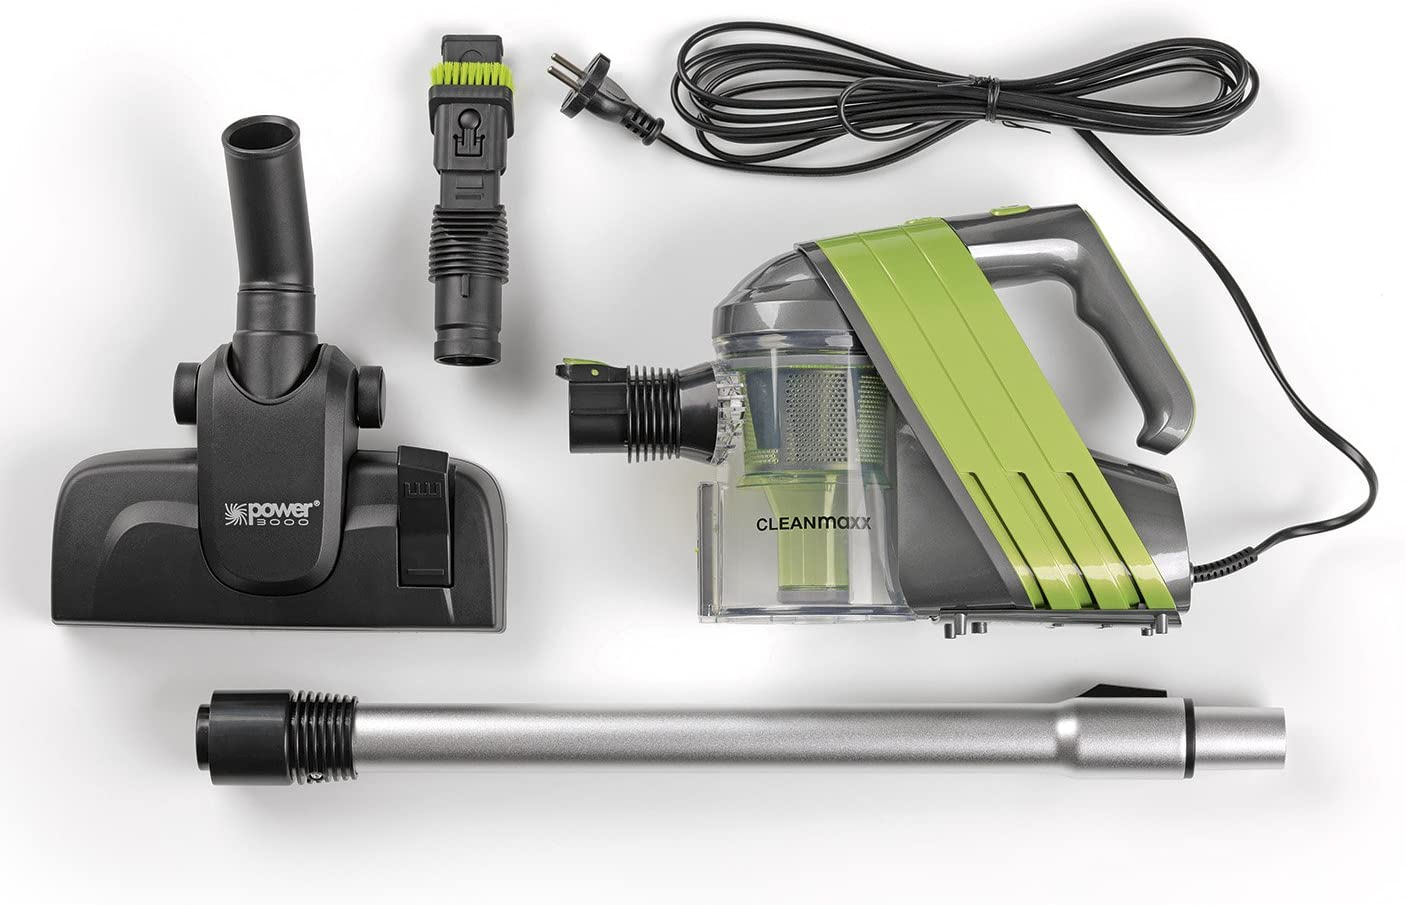 Clean Maxx 09668 – Aspirador ciclónico sin bolsa (400 W, – Aspiradora de mano con cable, Aspiradora con tubo telescópico y amplia accesorios, 0,6 litros de capacidad.): Amazon.es: Hogar